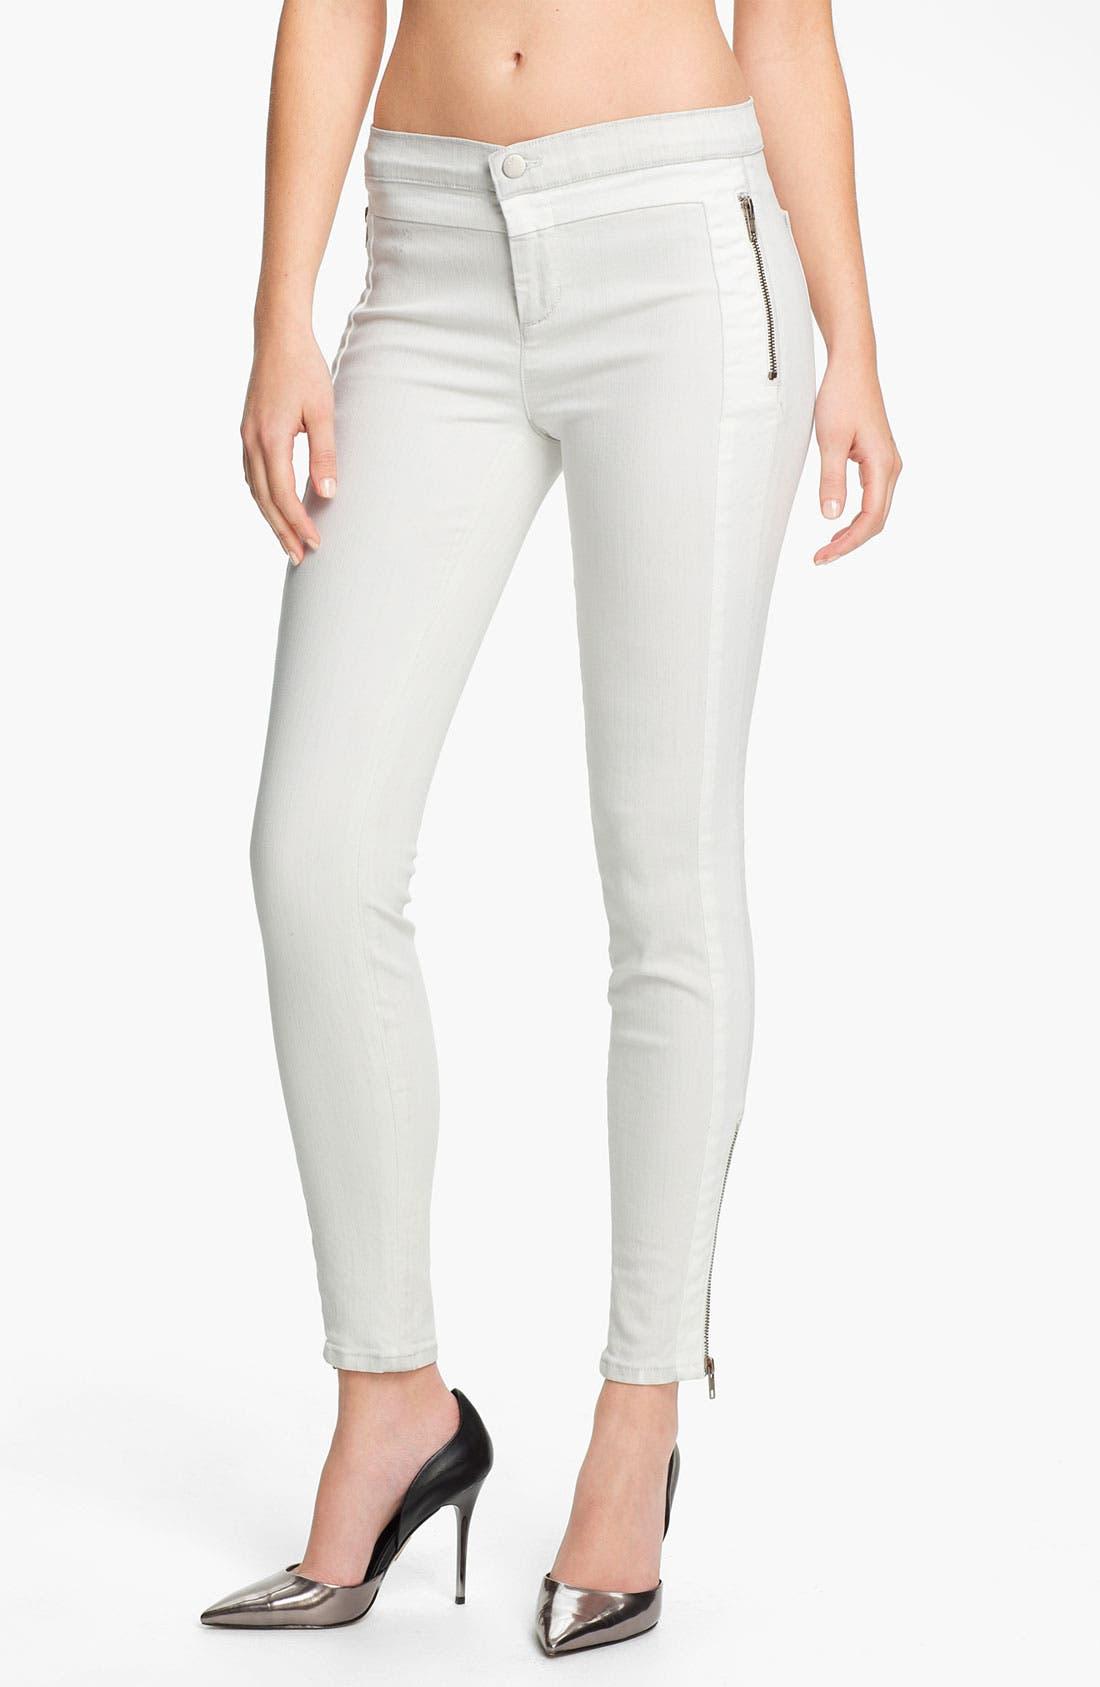 Alternate Image 1 Selected - J Brand 'Kera' Tuxedo Stripe Skinny Jeans (Iceberg)